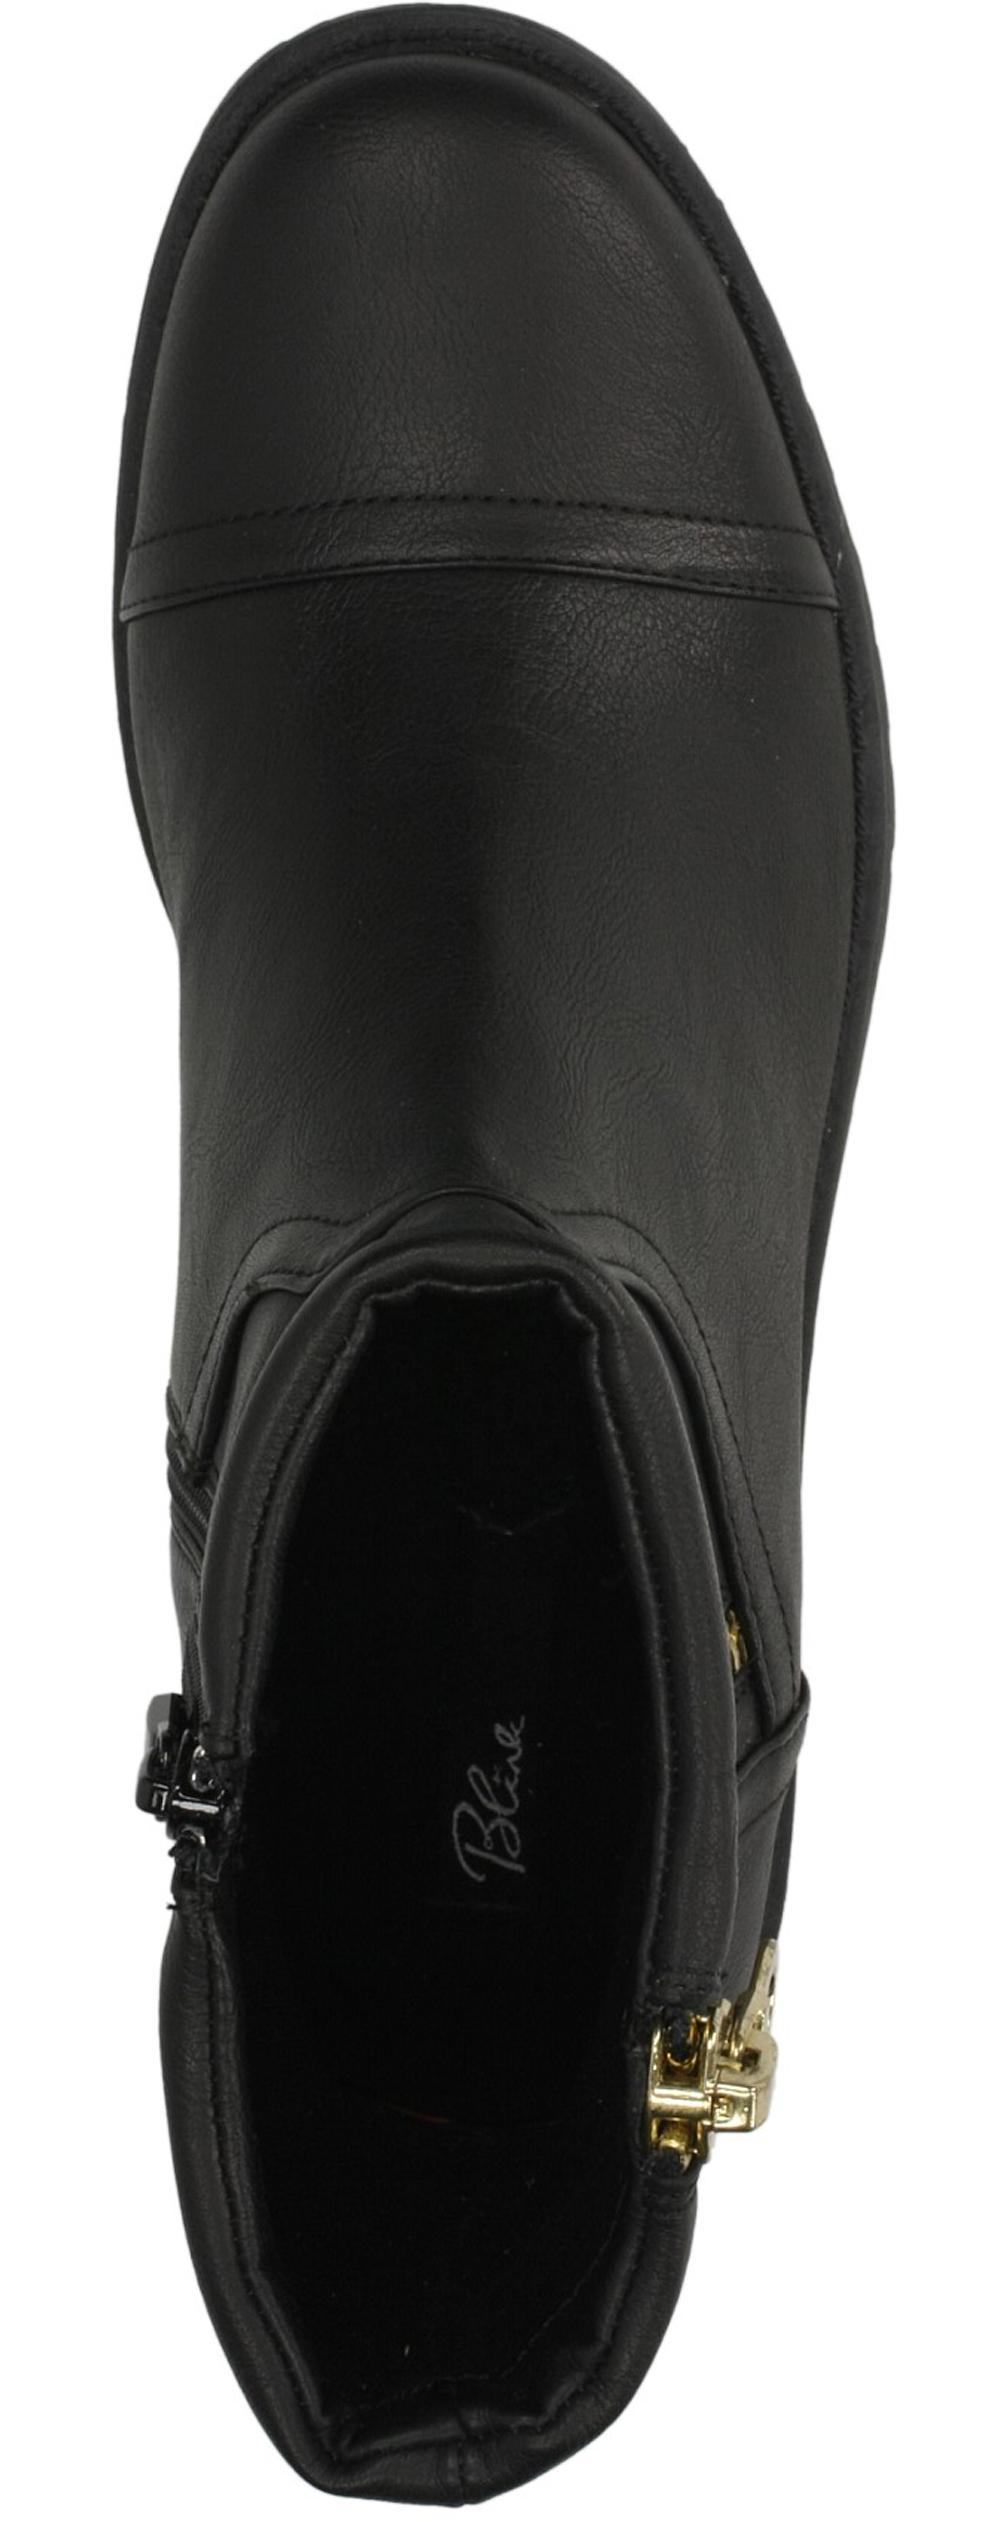 Damskie BOTKI BLINK 400639-C-21 czarny;;